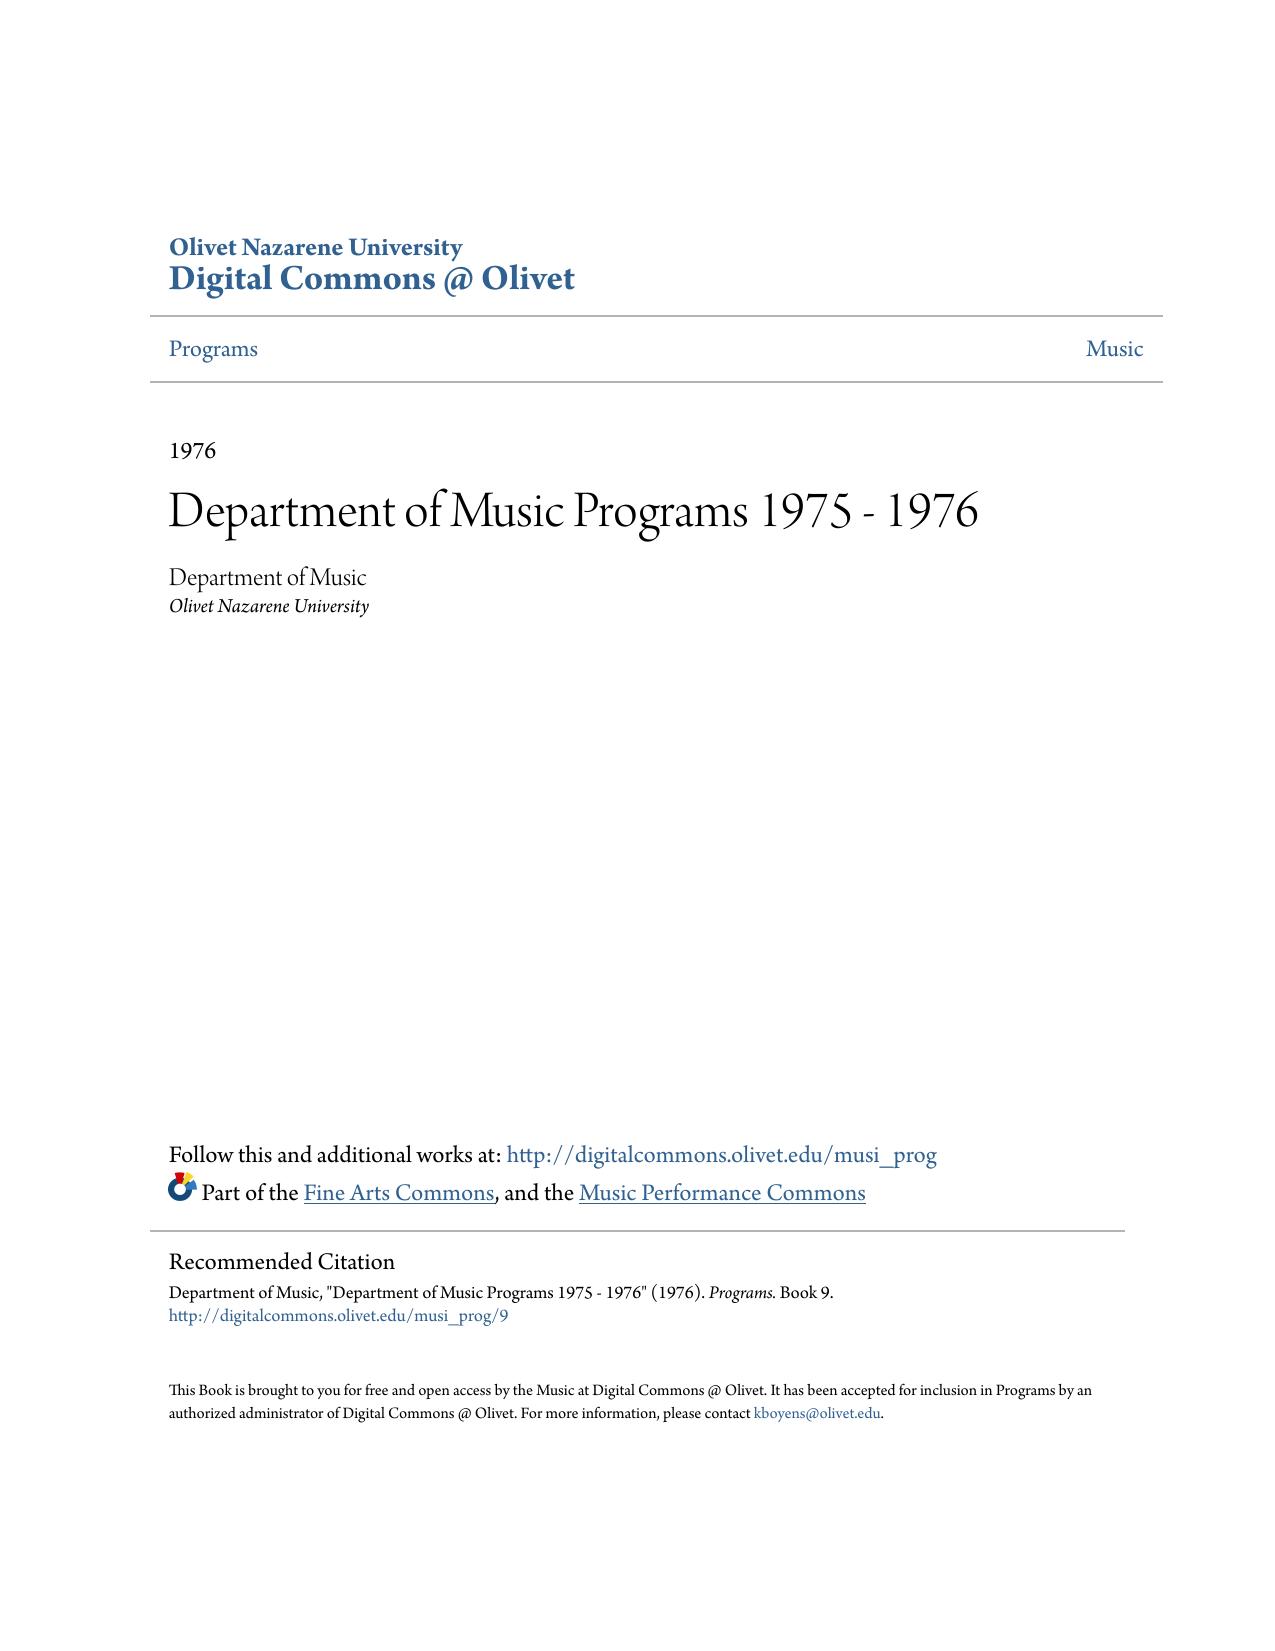 Department Of Music Programs 1975 1976